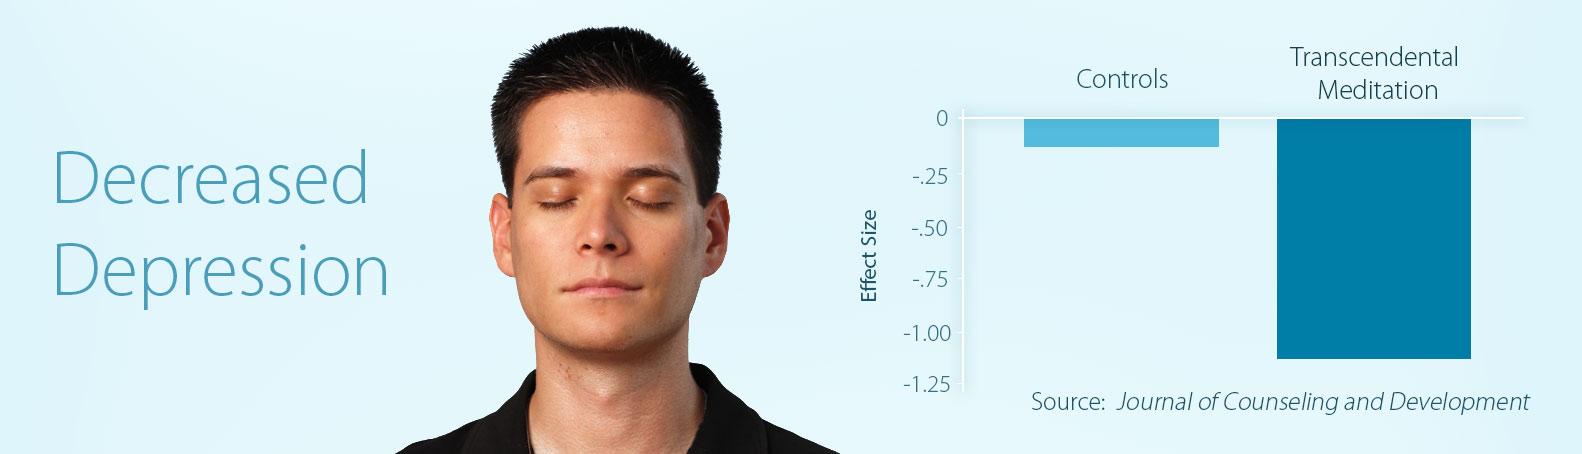 TM and Depression Study Chart